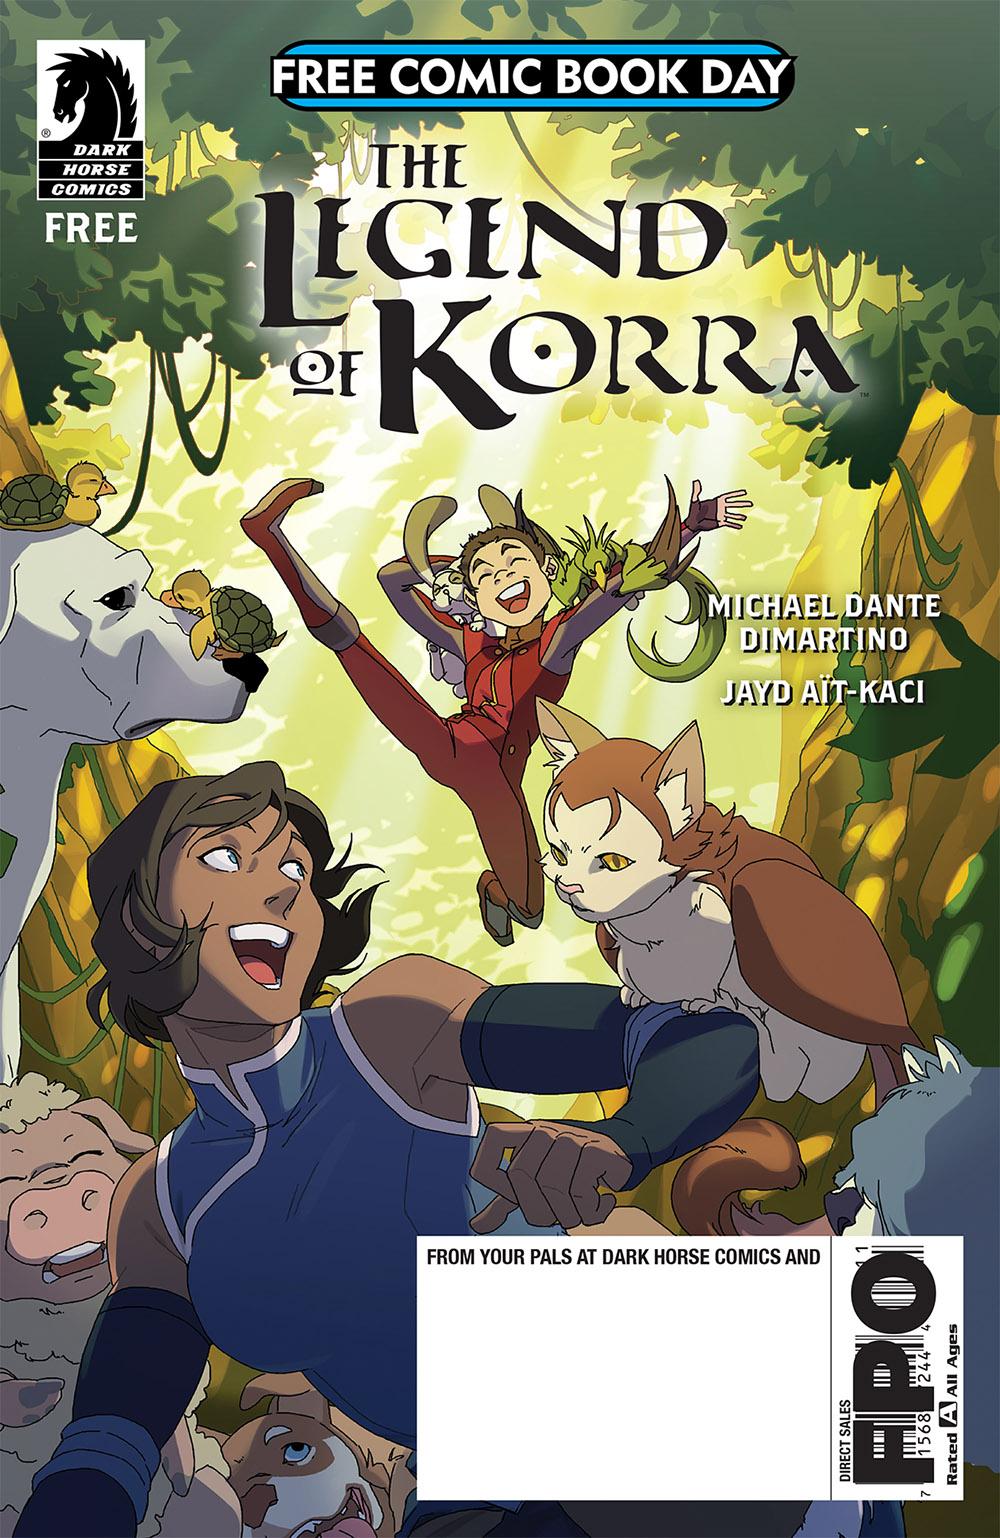 FCBD18_S_Dark Horse_Legend of Korra.jpg